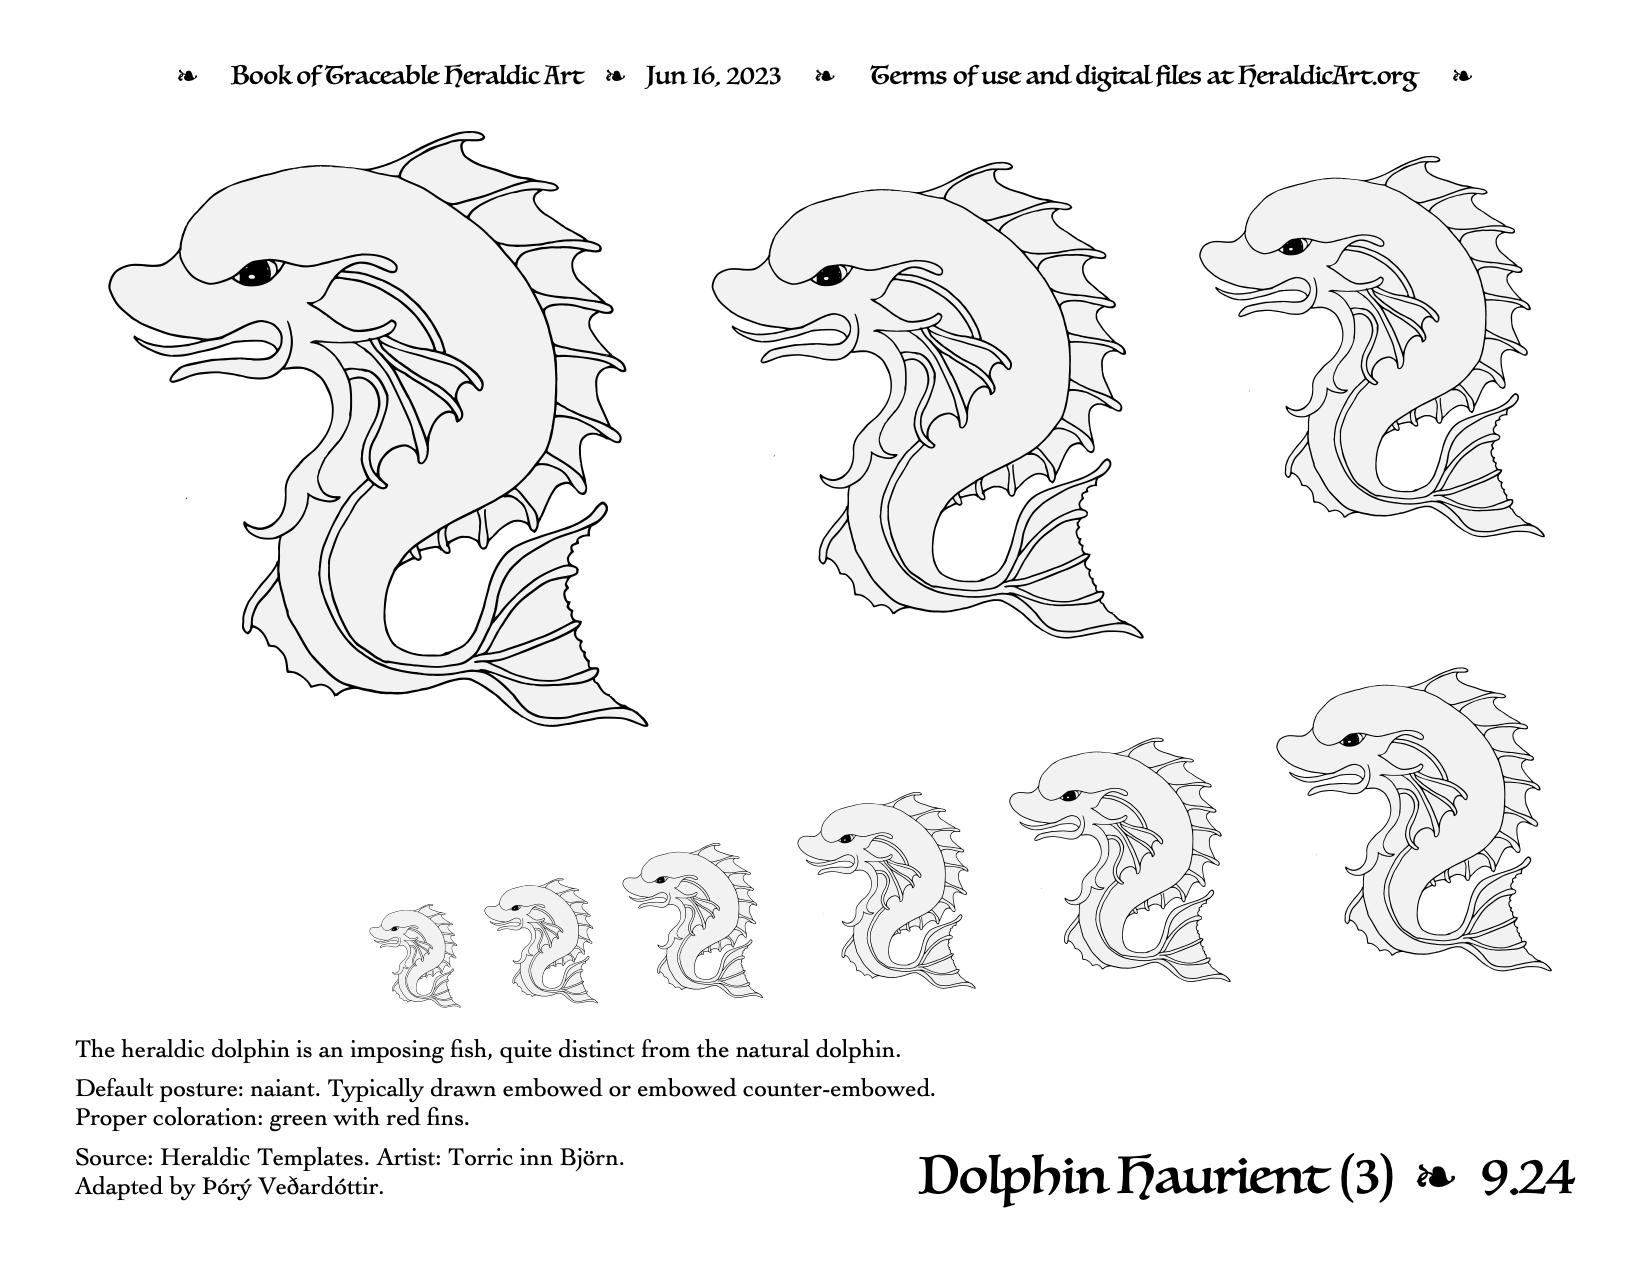 Dolphin - Traceable Heraldic Art